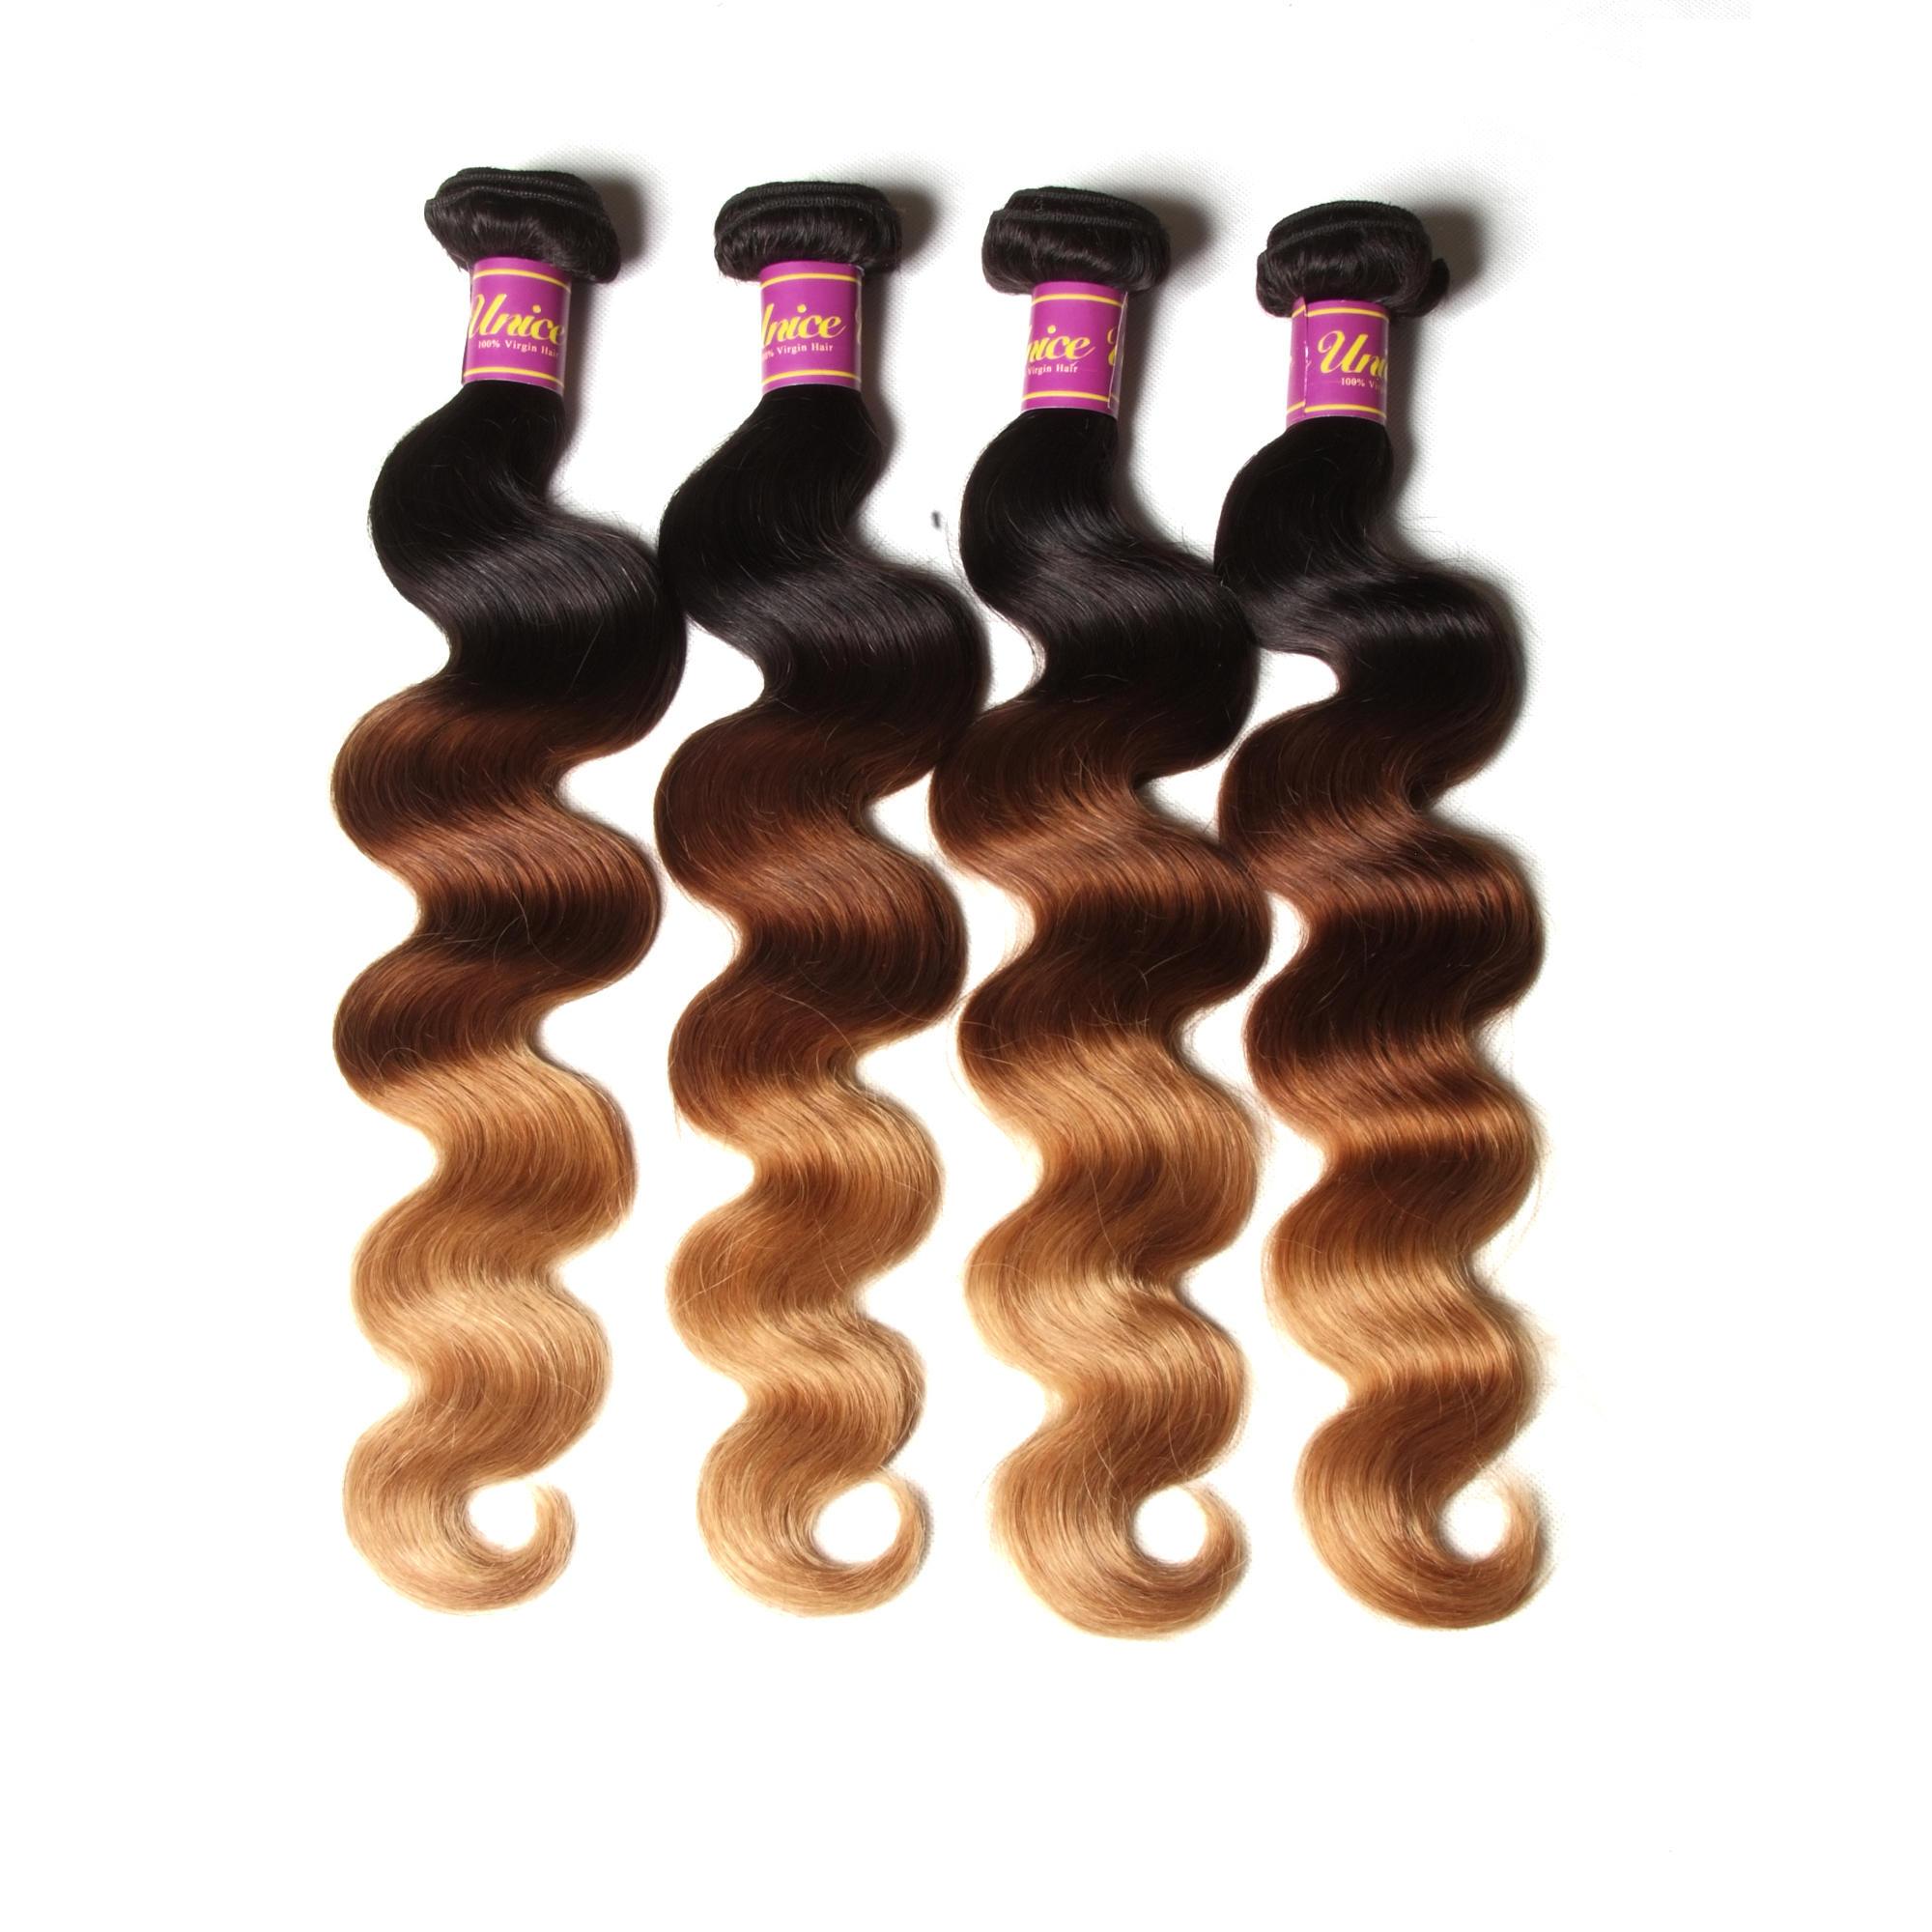 UNice Hair image 15